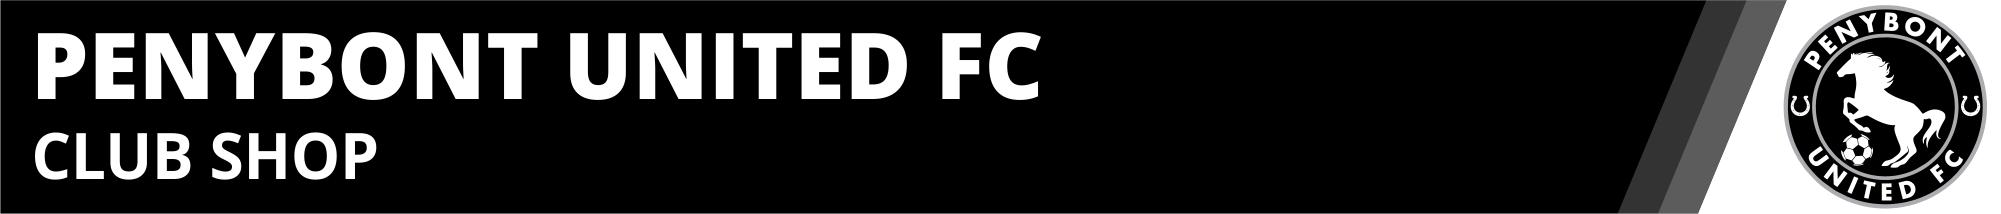 penybont-united-fc-club-shop-banner.png